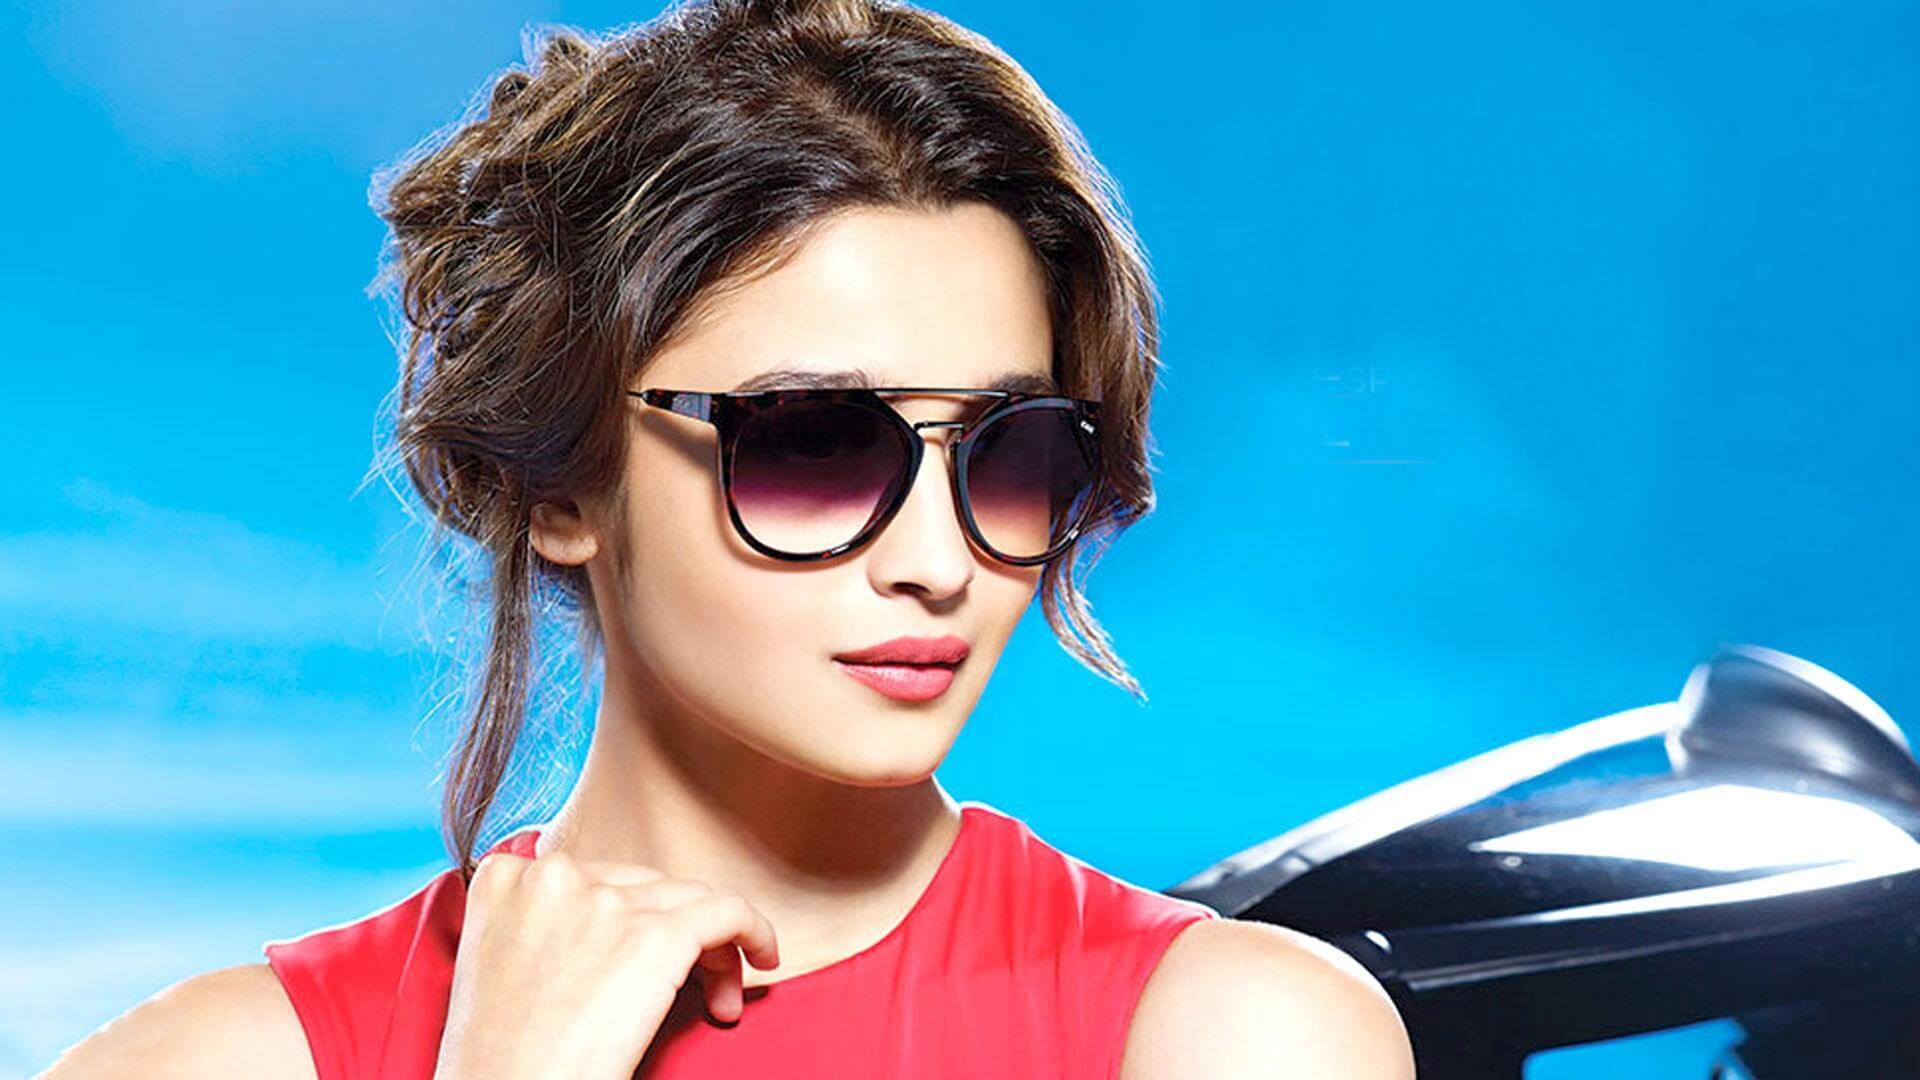 Alia Bhatt Wiki, Age, Weight, Height, Family, Career, Boyfriend, Father, Sister, Caste, Biography, Latest Movie